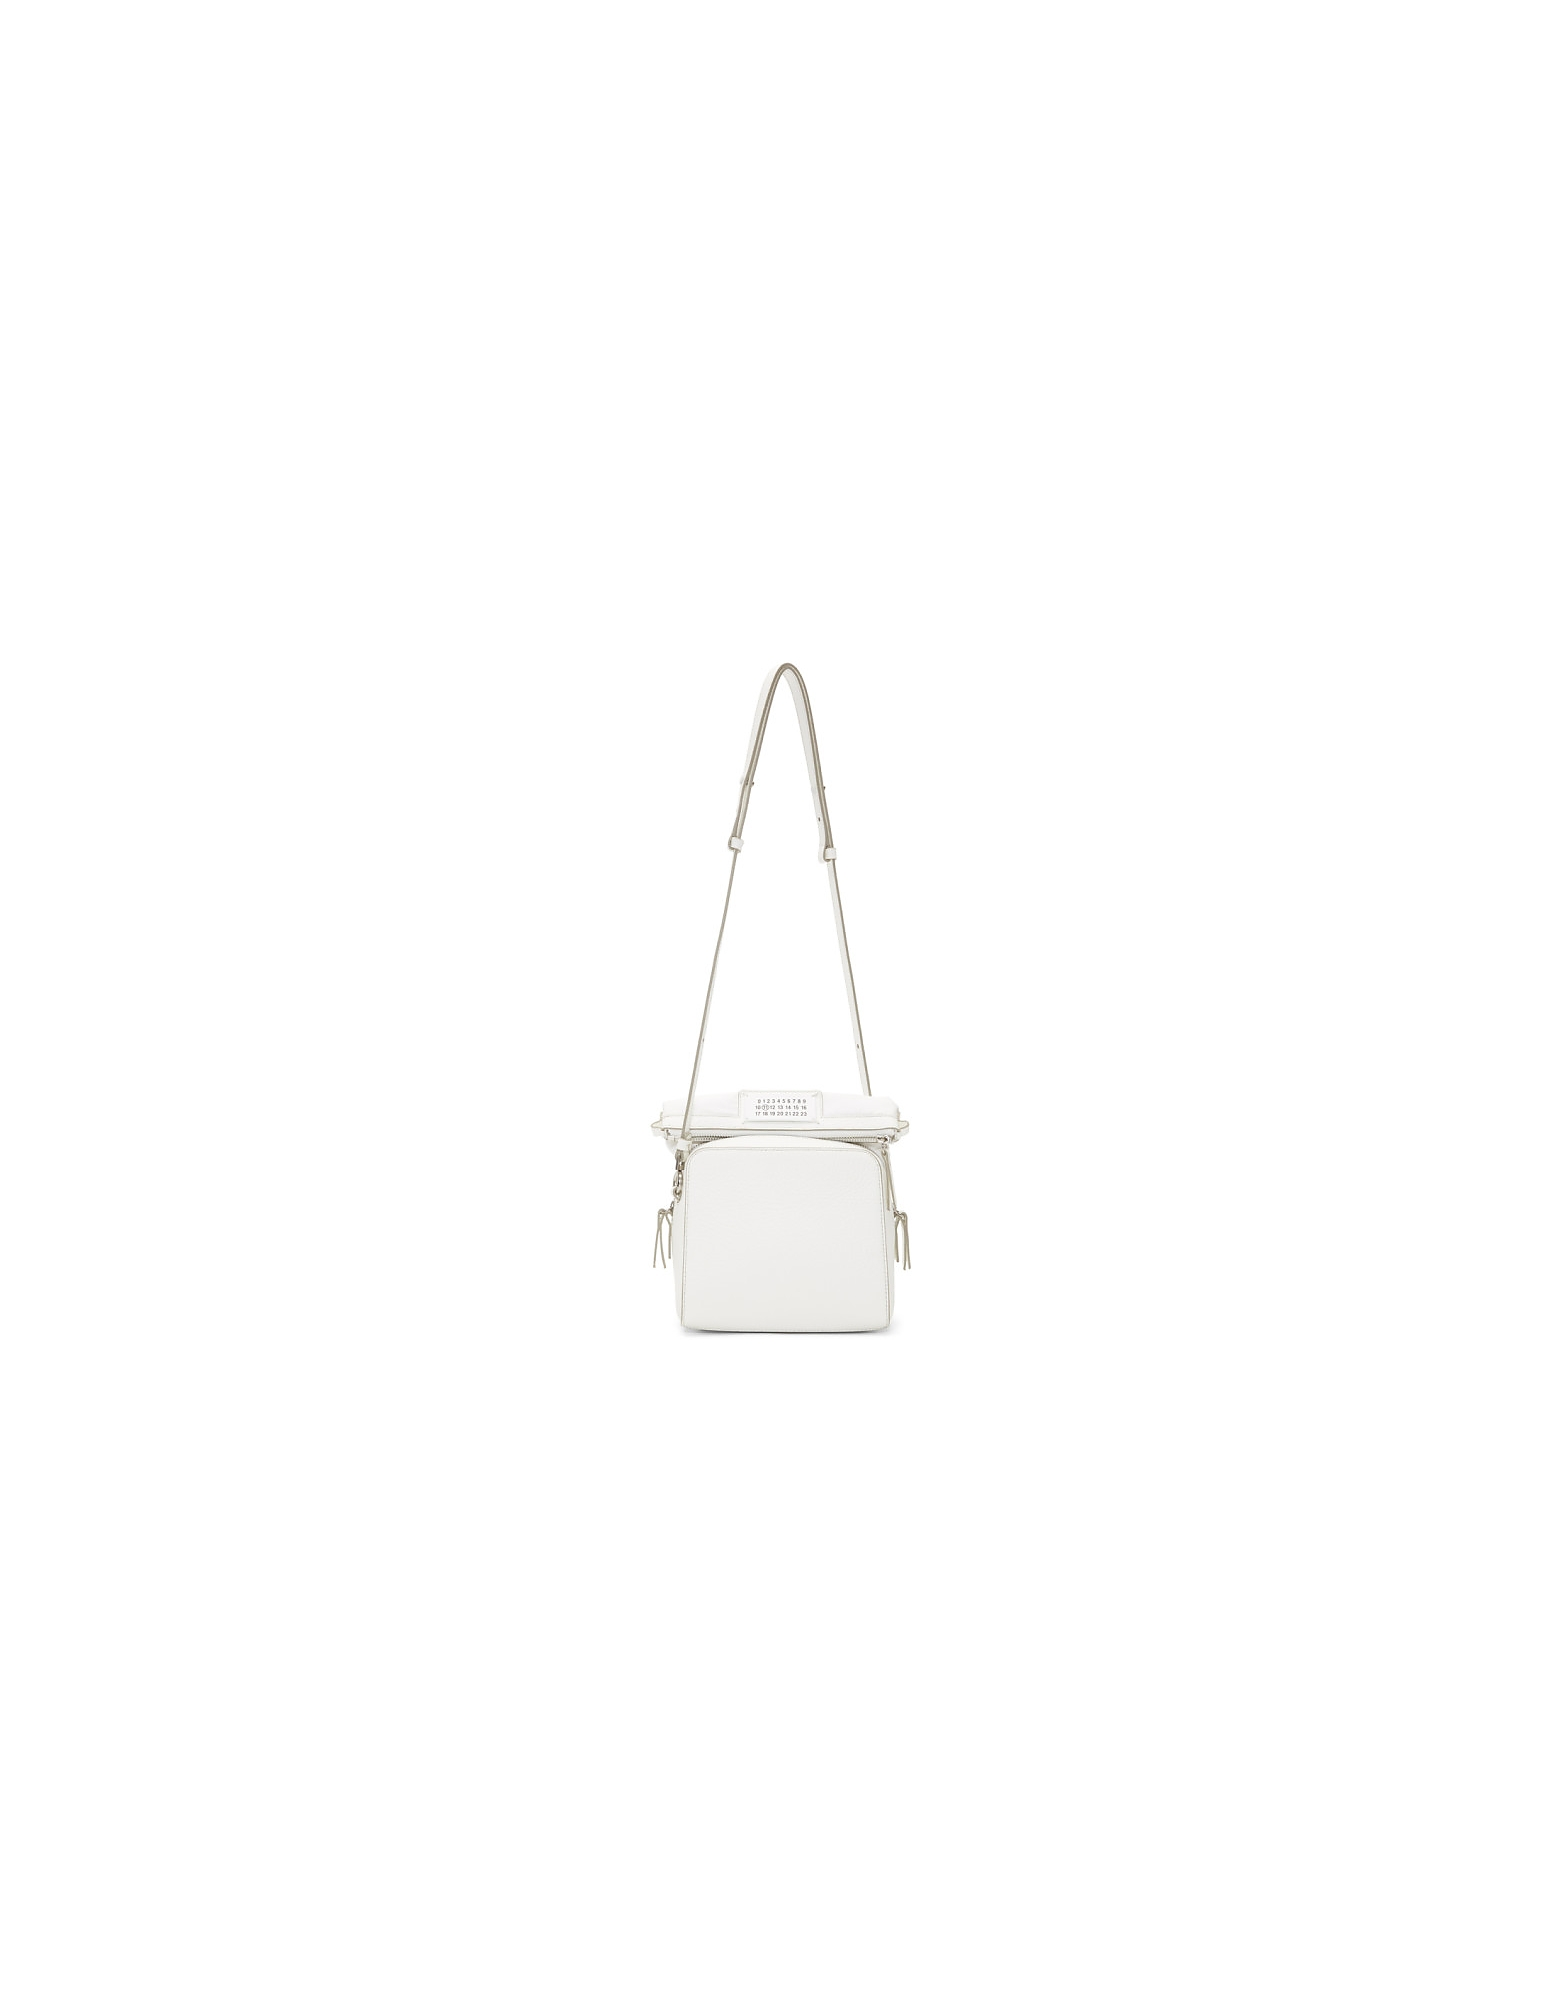 Maison Margiela Designer Handbags, White Small Rectangular 5AC Bag